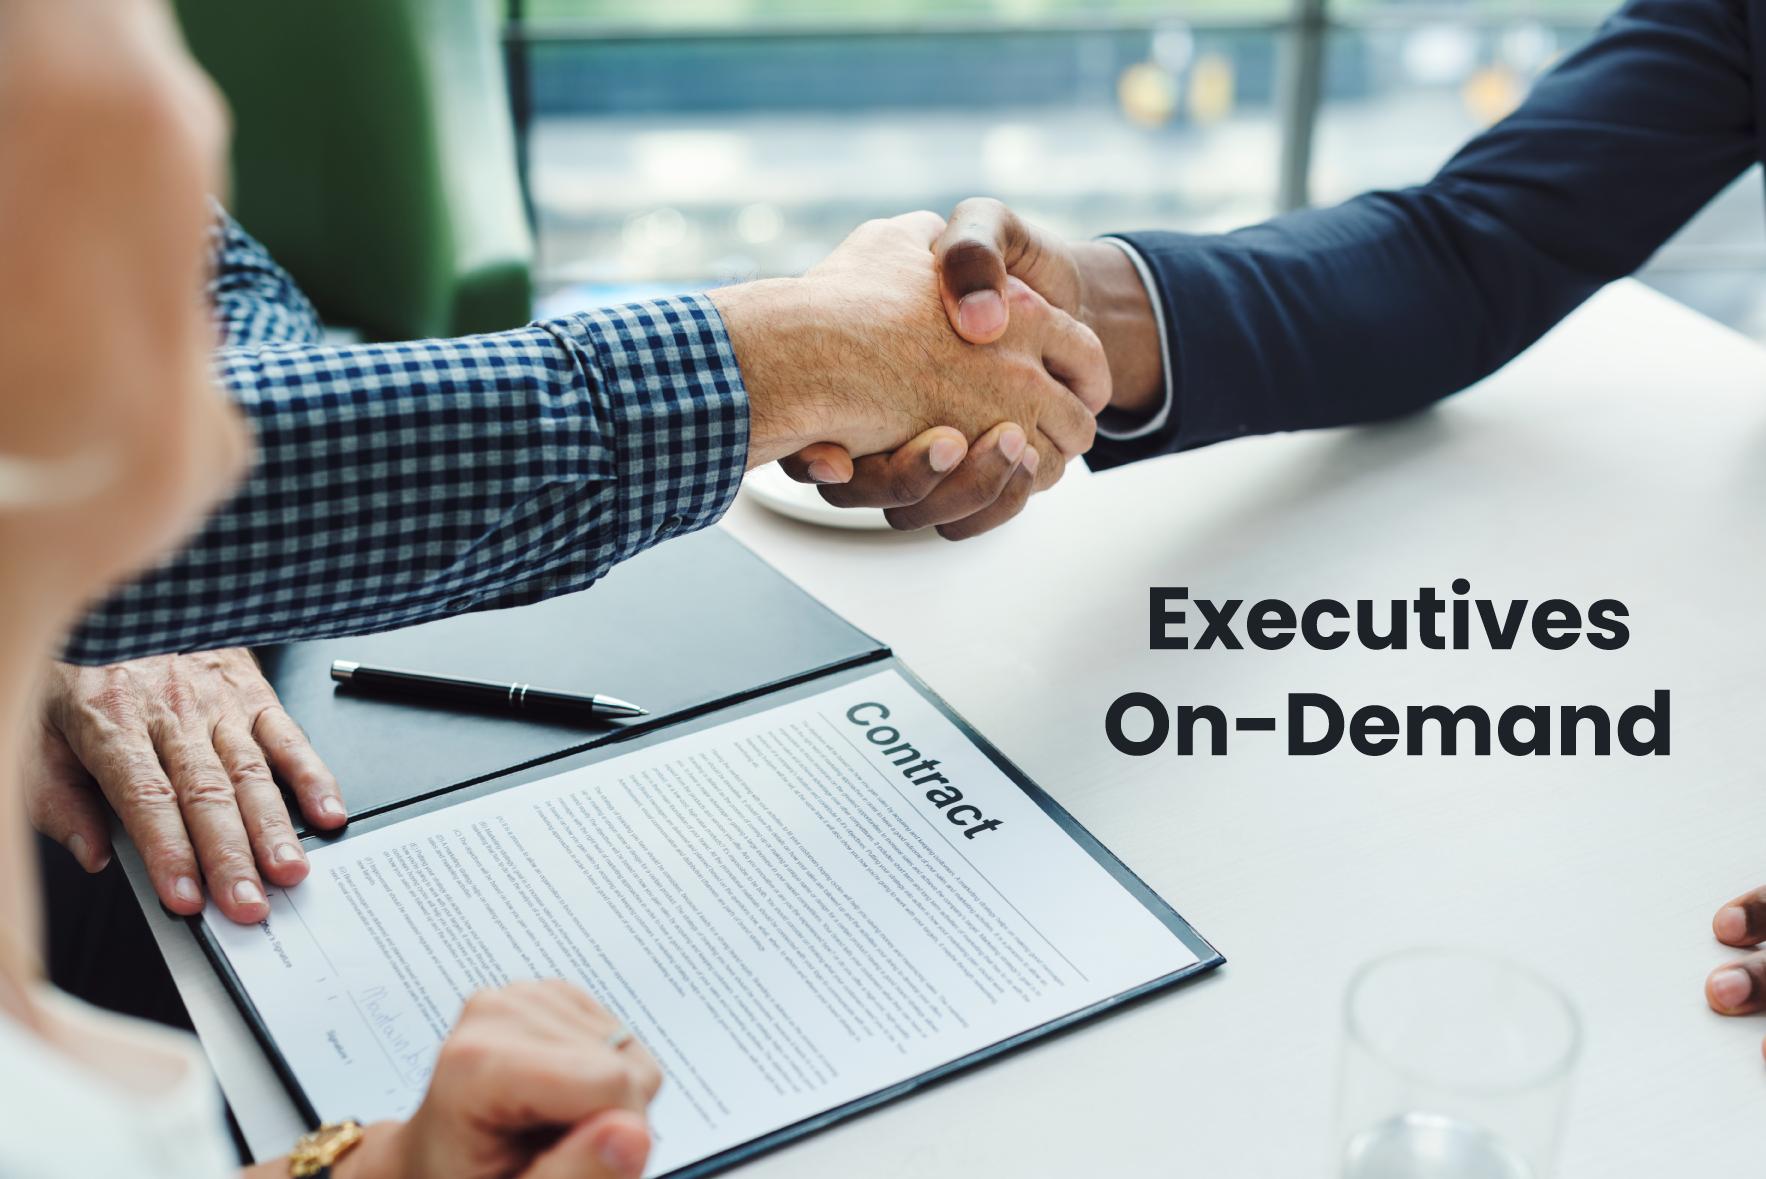 Executives On-Demand